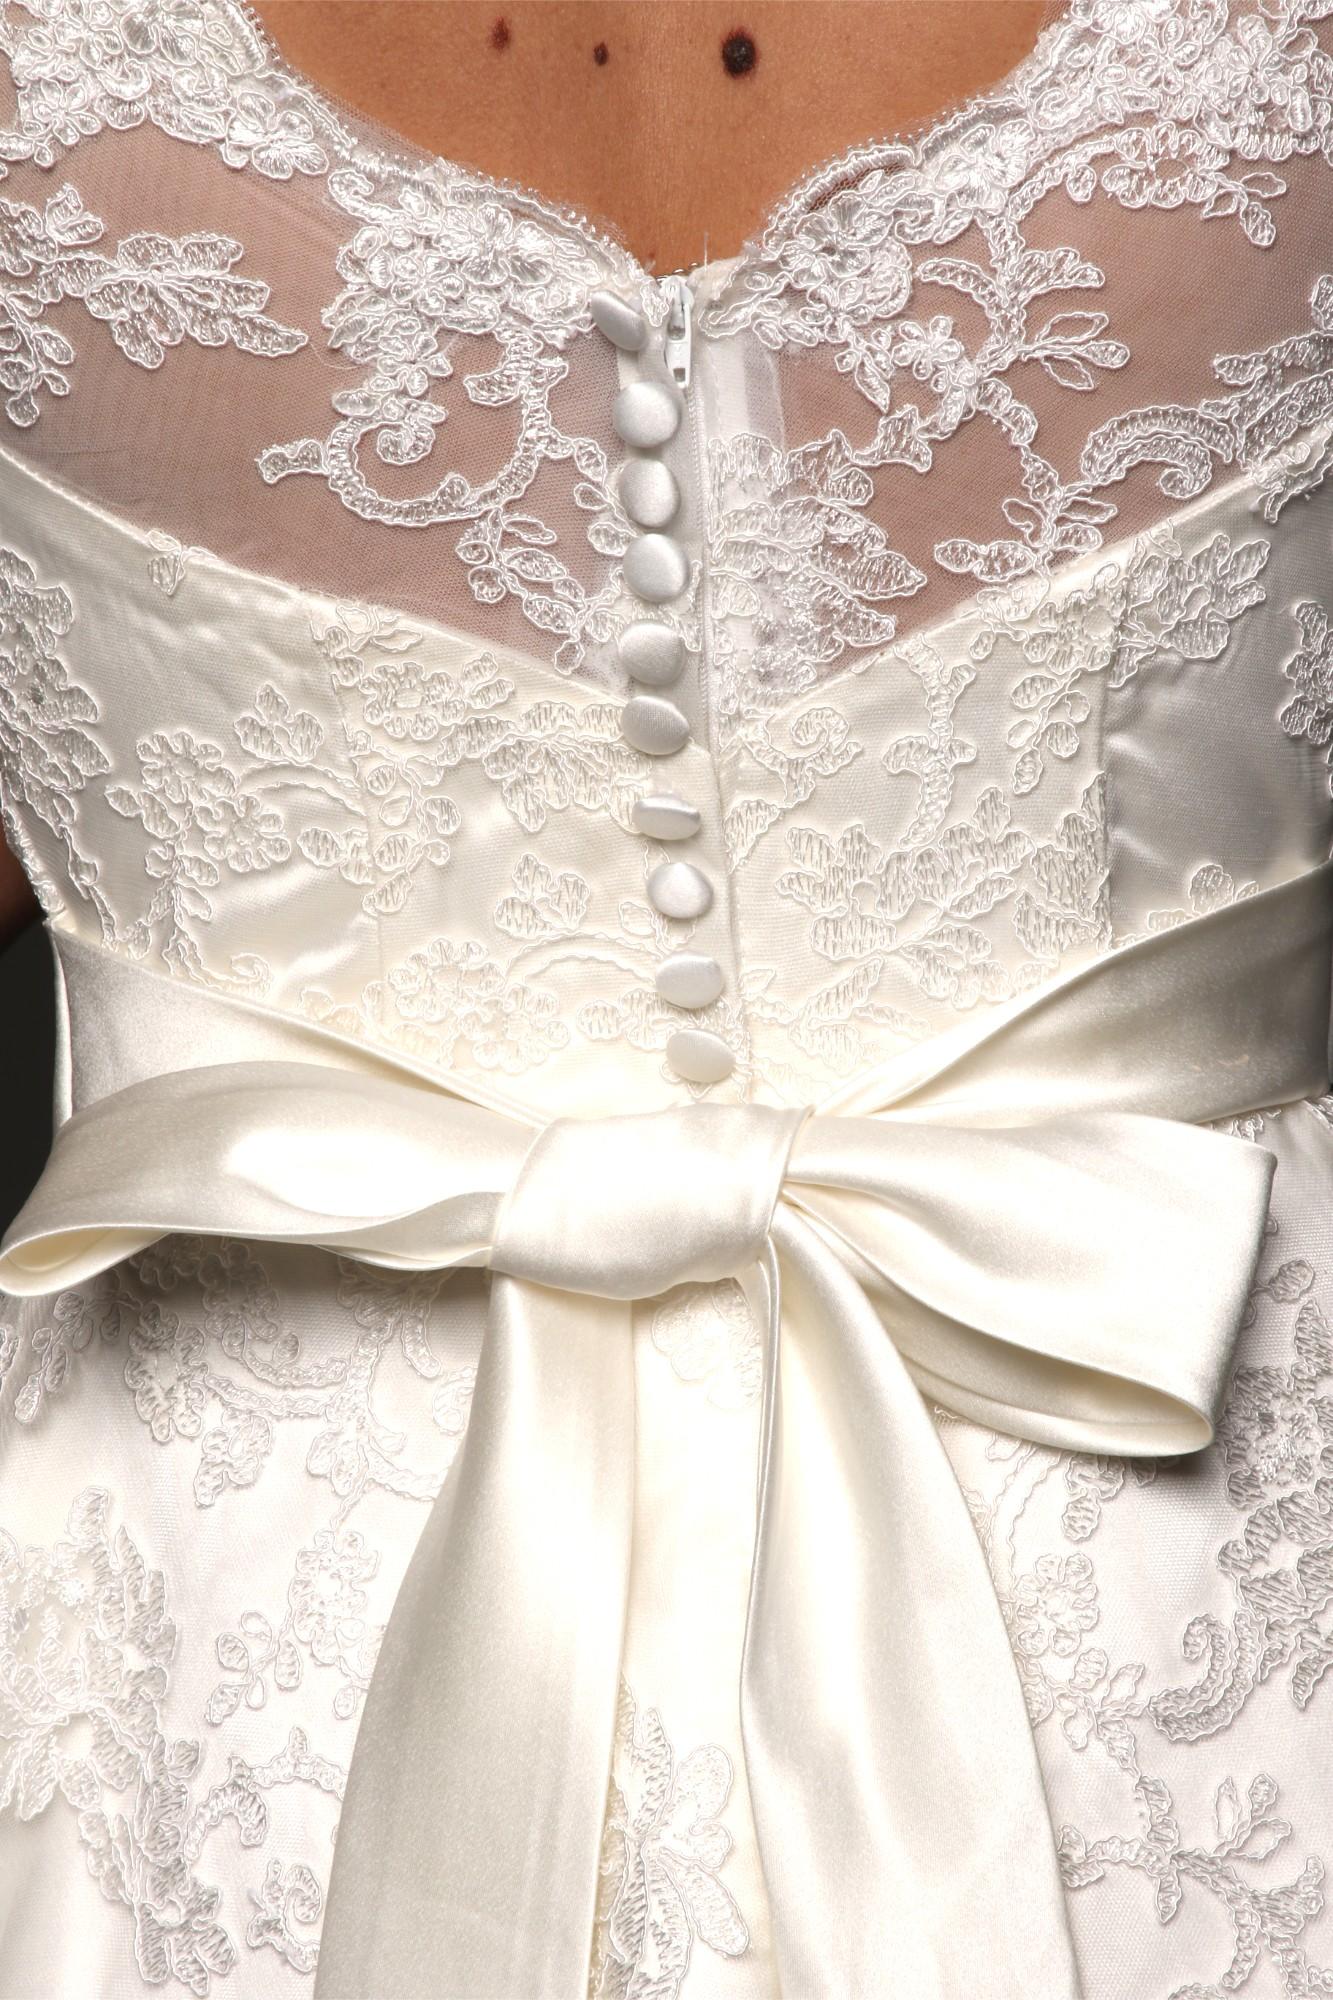 Robe de Coeur - Robe de mariée - Albi - Tarn - robe occasion - petit budget -